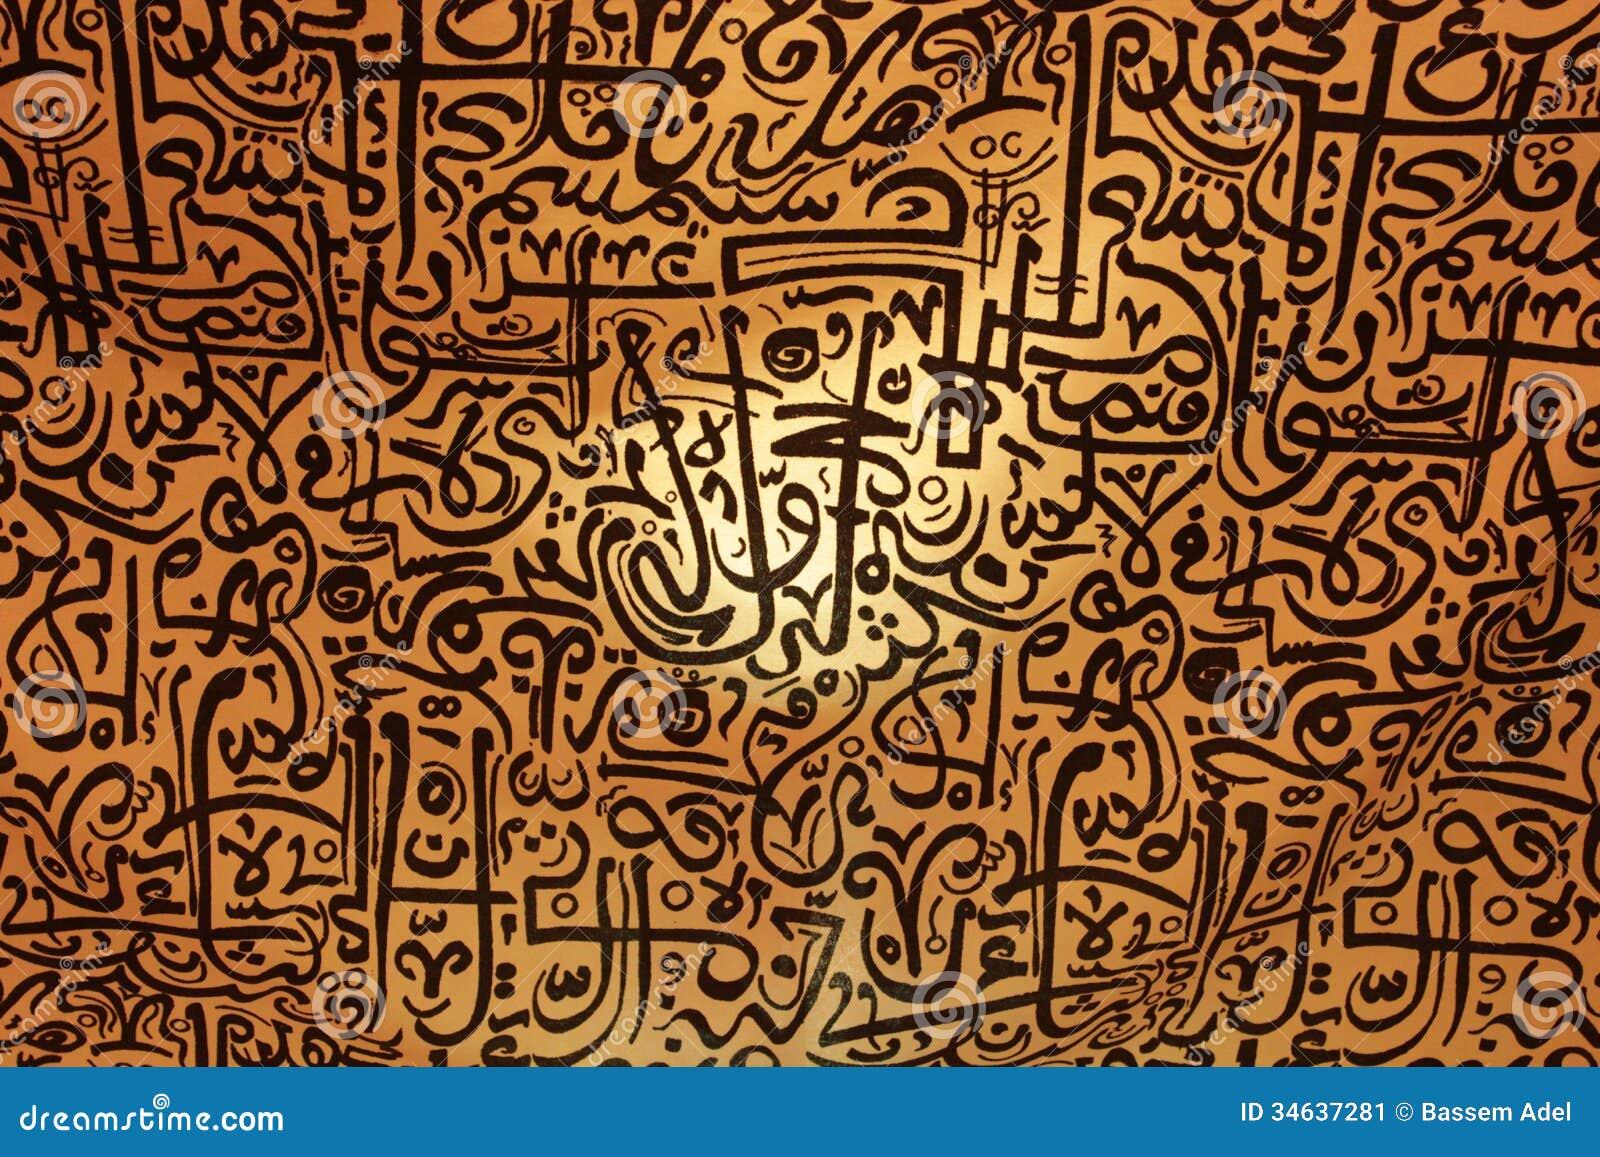 Islamic Art Stock Image Image 34637281